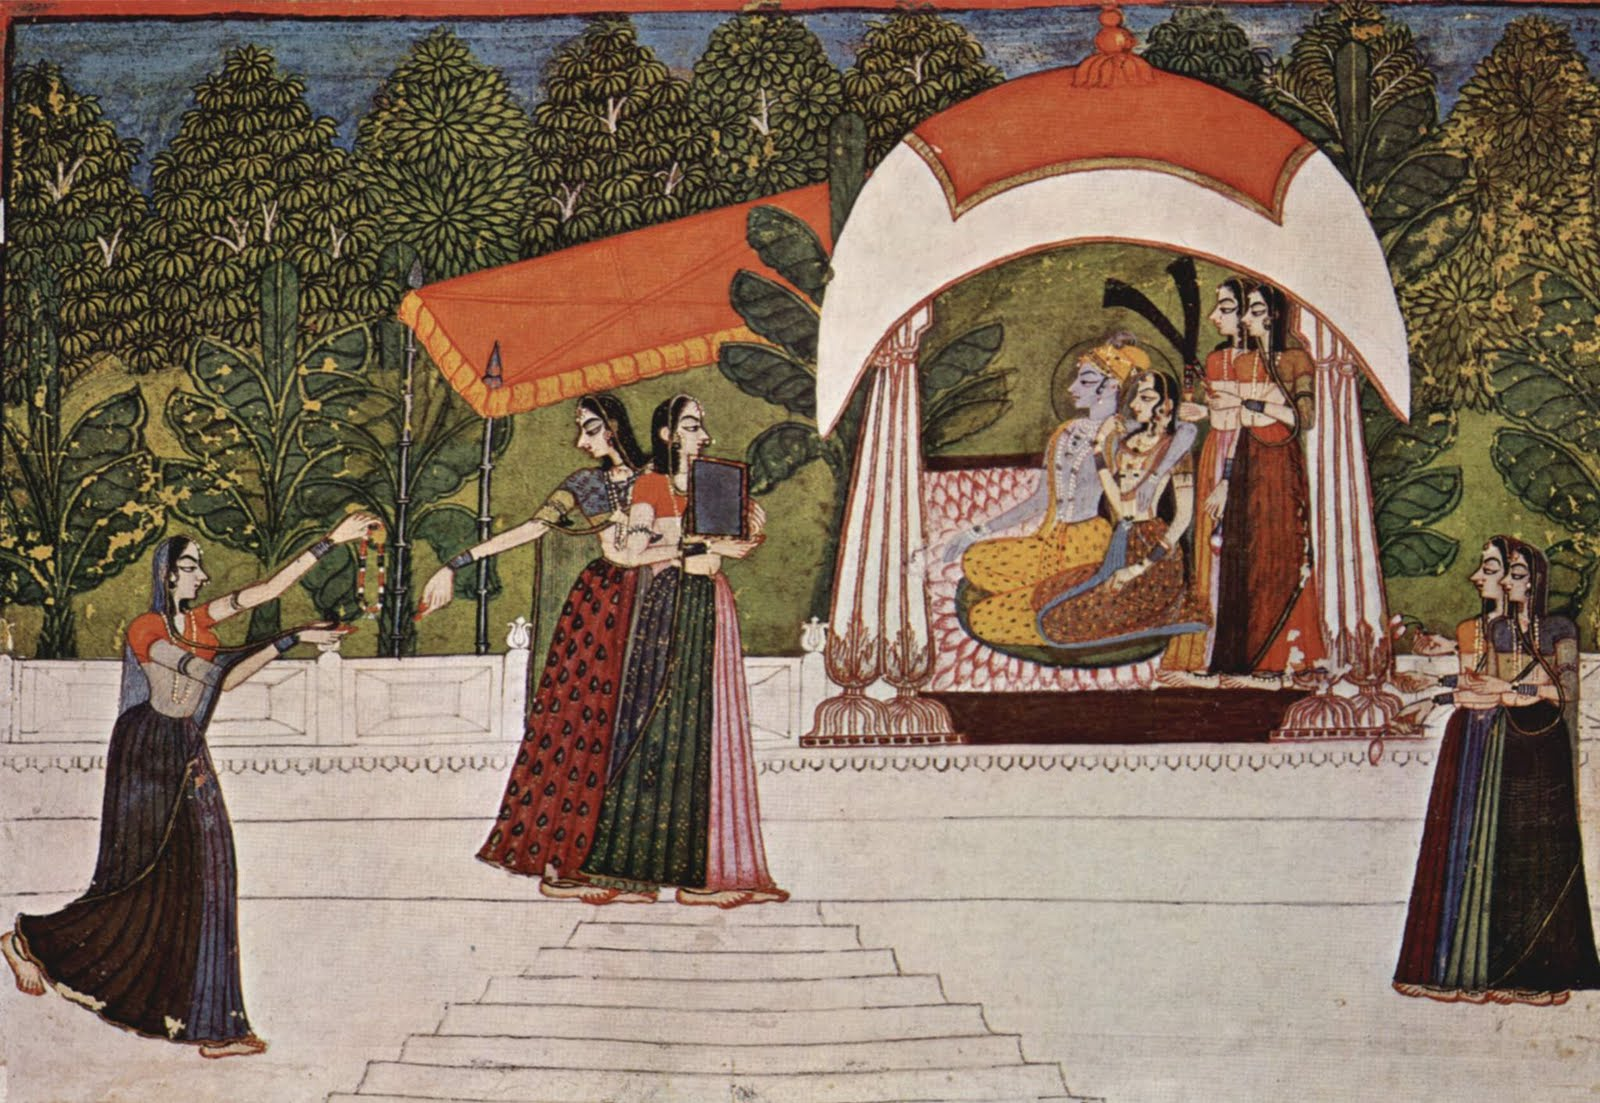 Radha Krishna - Rajput Painting by Nihal Chand ca. 1750